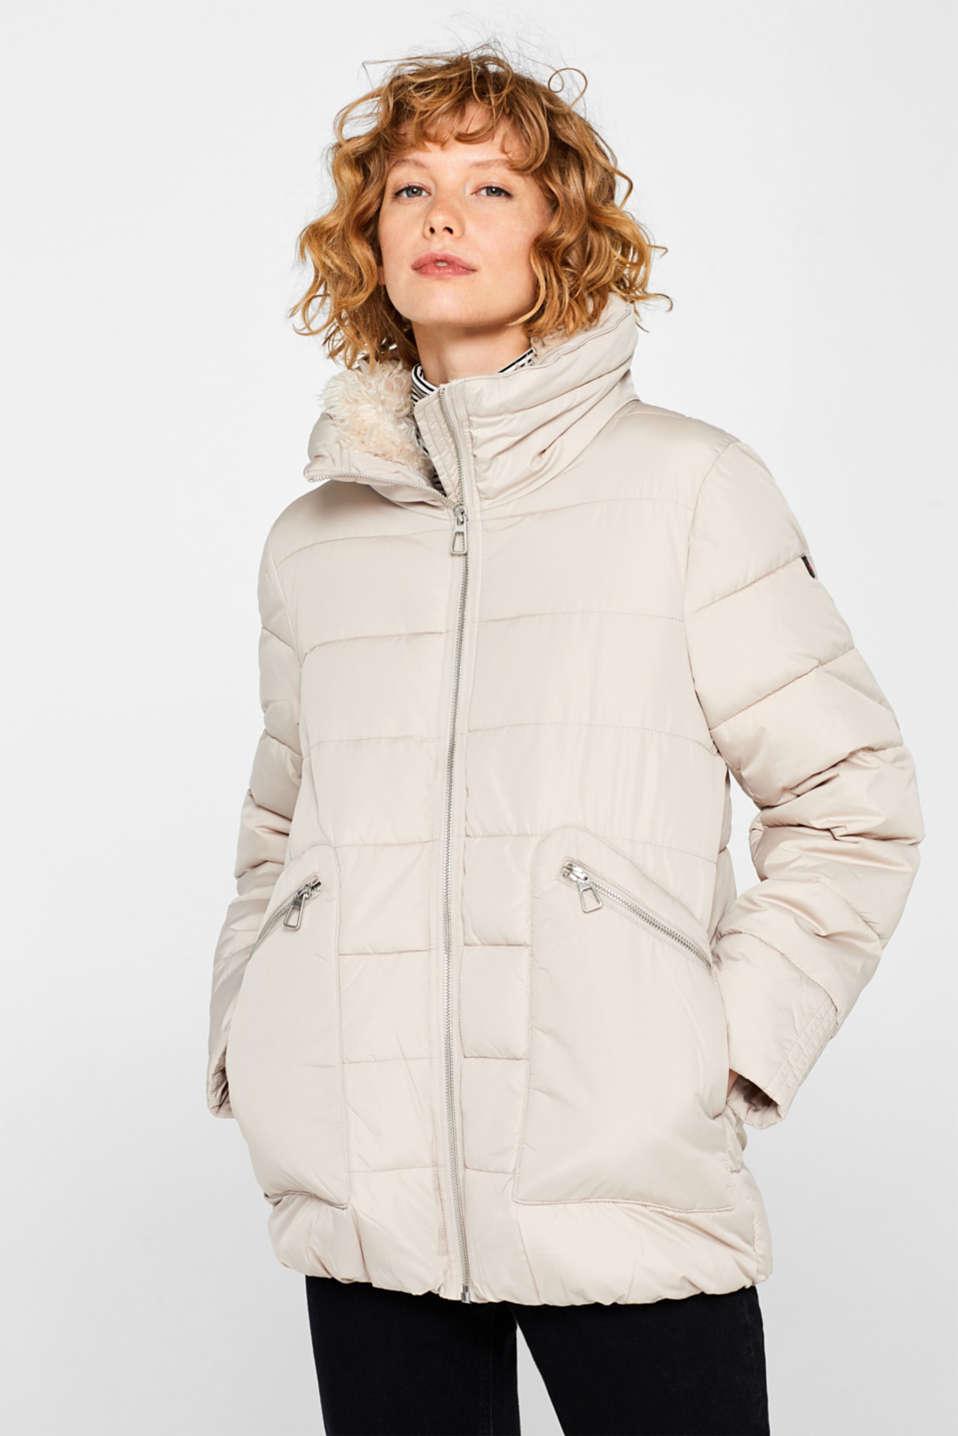 Jackets outdoor woven, LIGHT BEIGE, detail image number 0